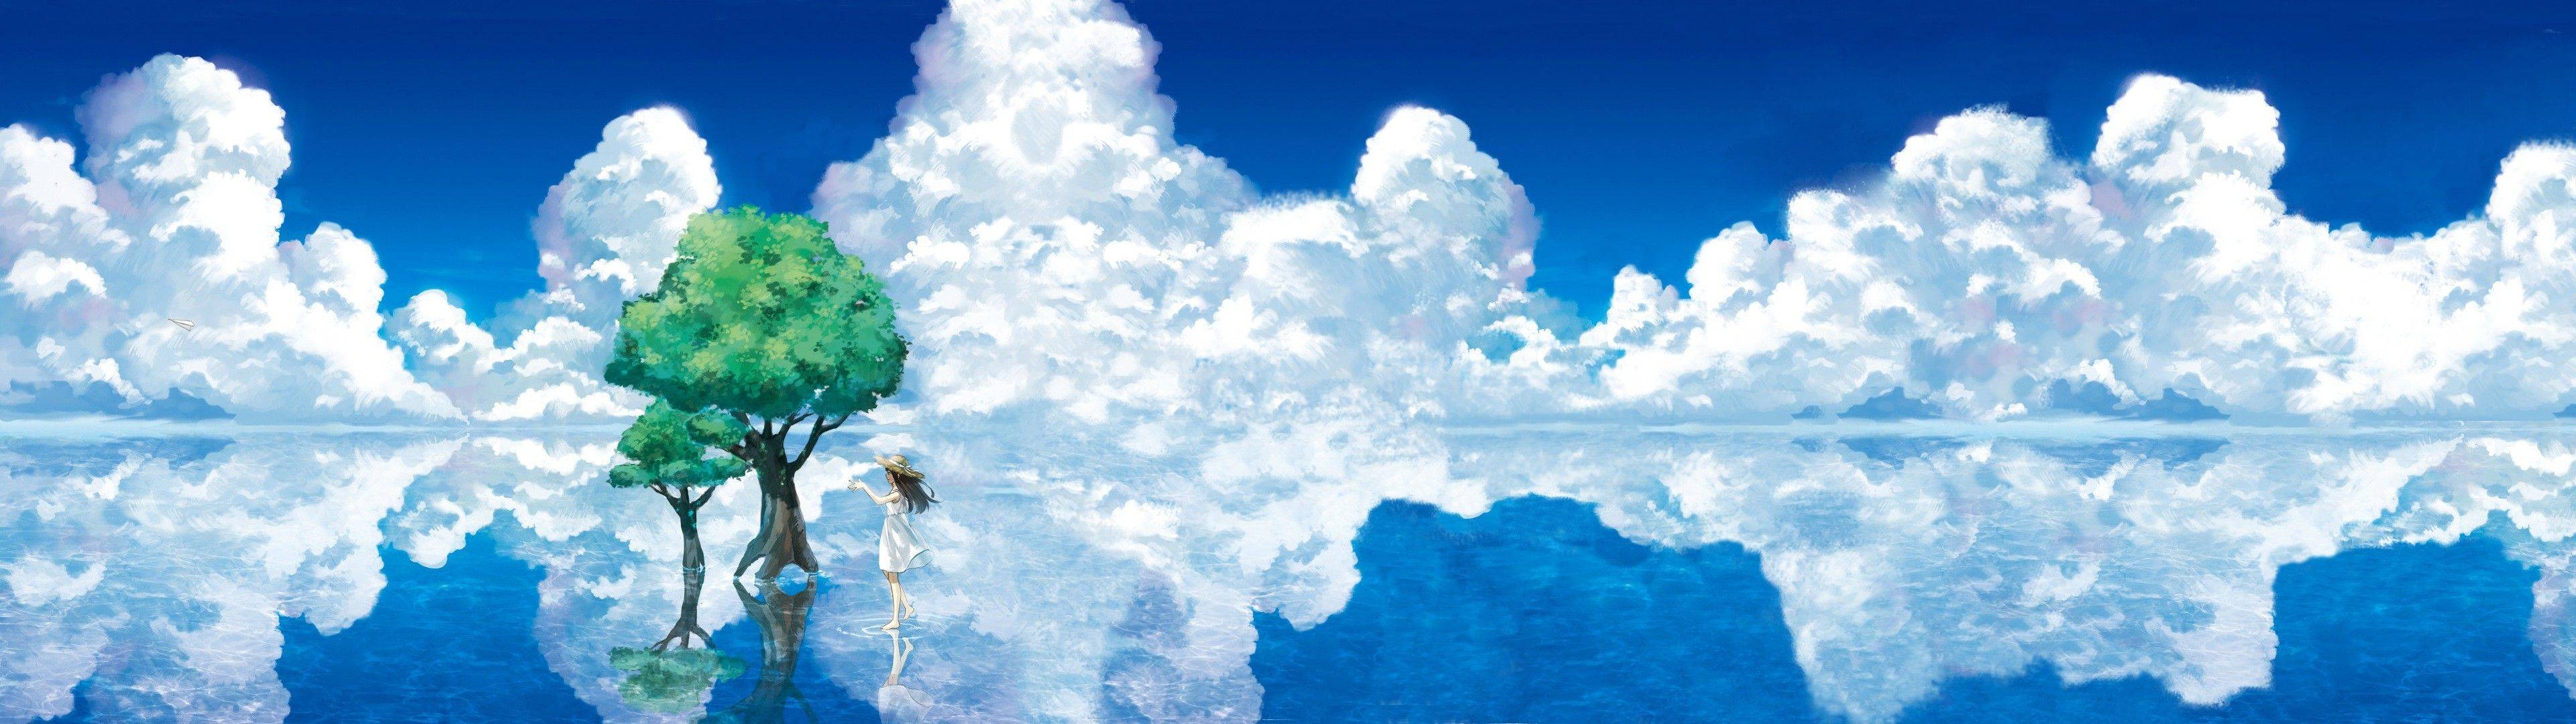 Trees Anime Reflection Anime Girls Sky Clouds Wallpaper Dual Screen Wallpaper 3840x1080 Wallpaper Scenery Wallpaper